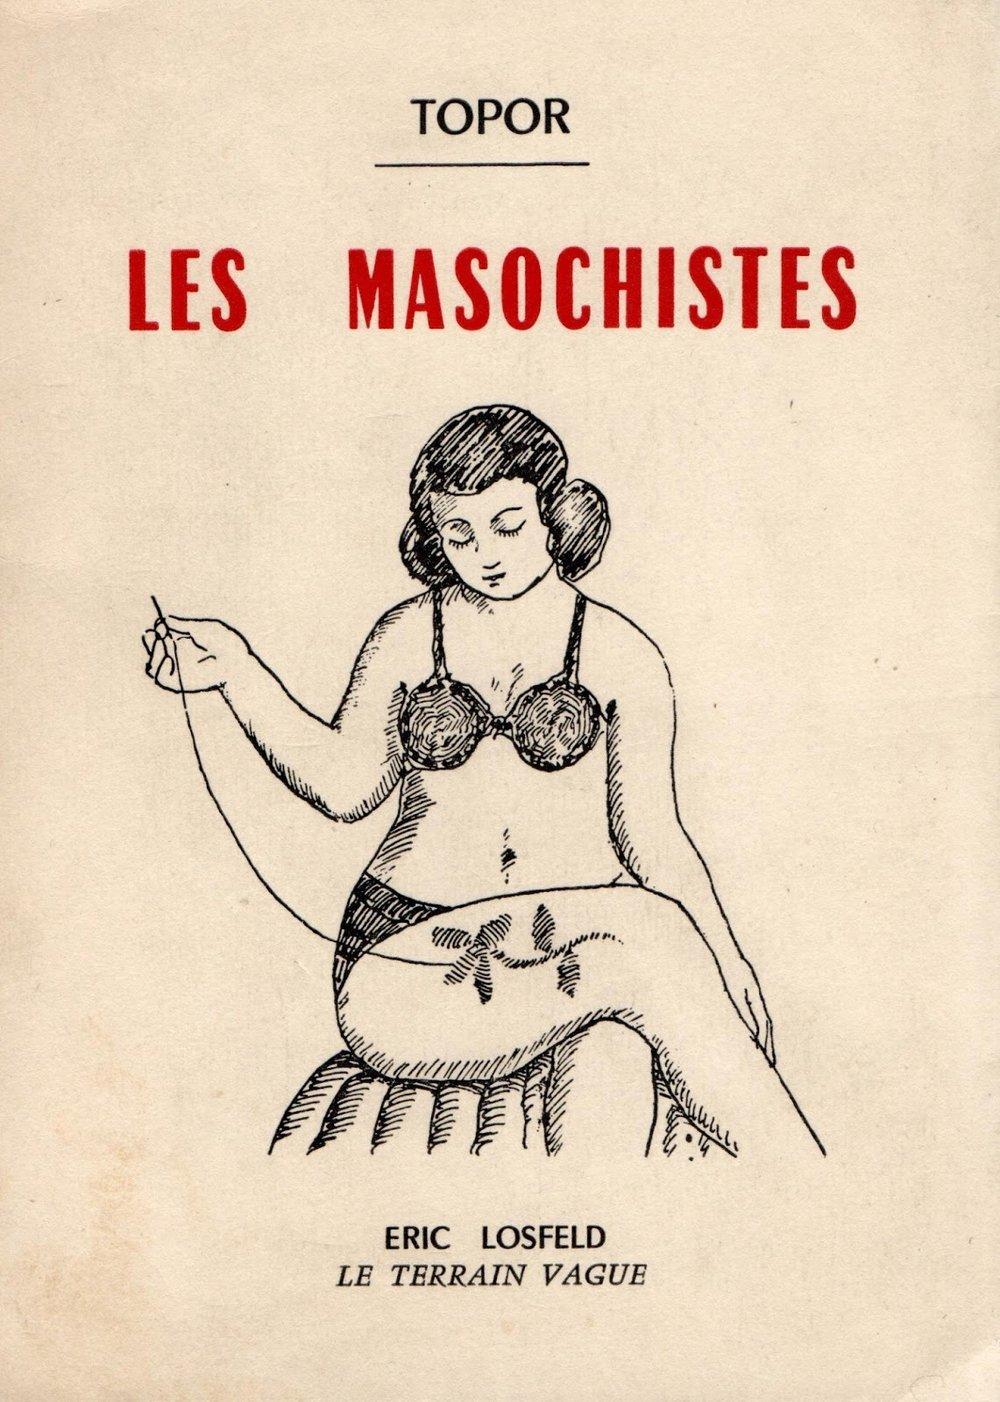 roland-topor-les-masochistes-eric-losfeld-scan-complet-par-mister-gutsy-1.jpg